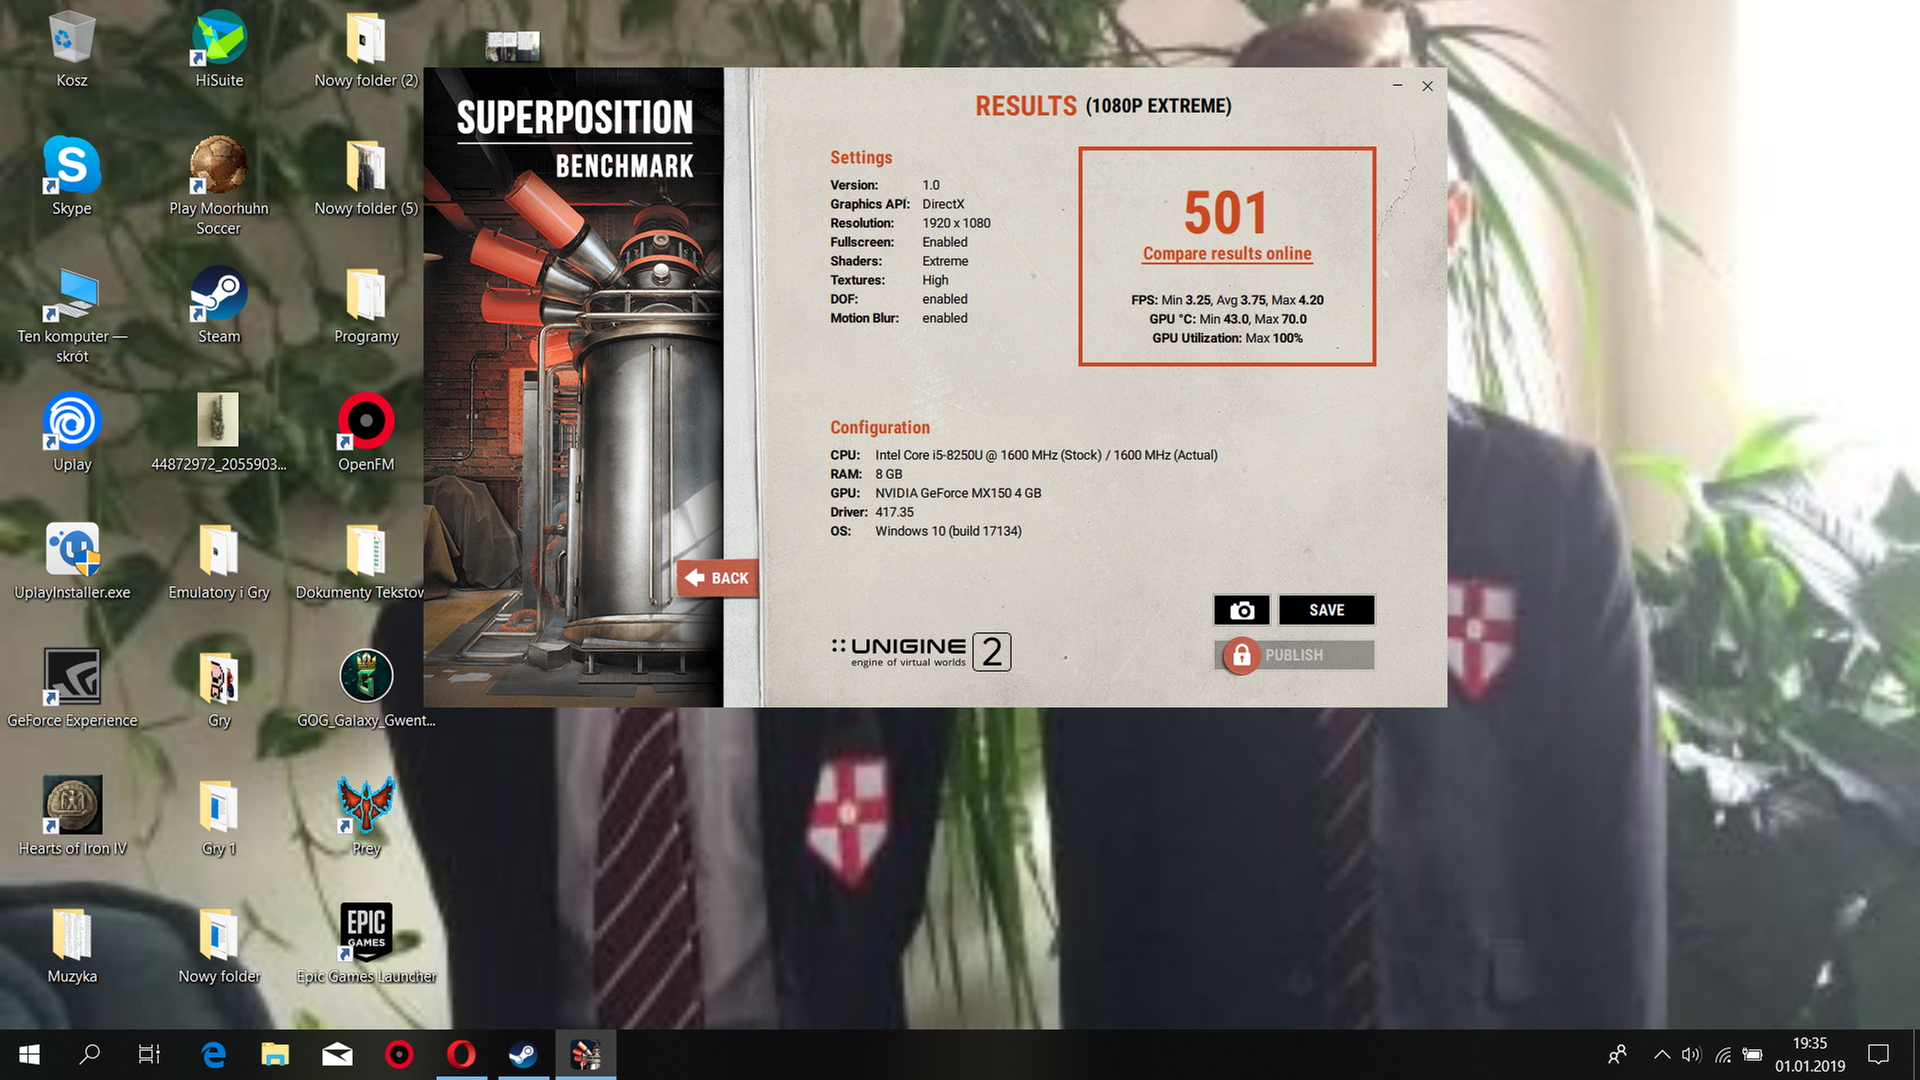 luki_1119`s Unigine Superposition - 1080P Xtreme score: 501